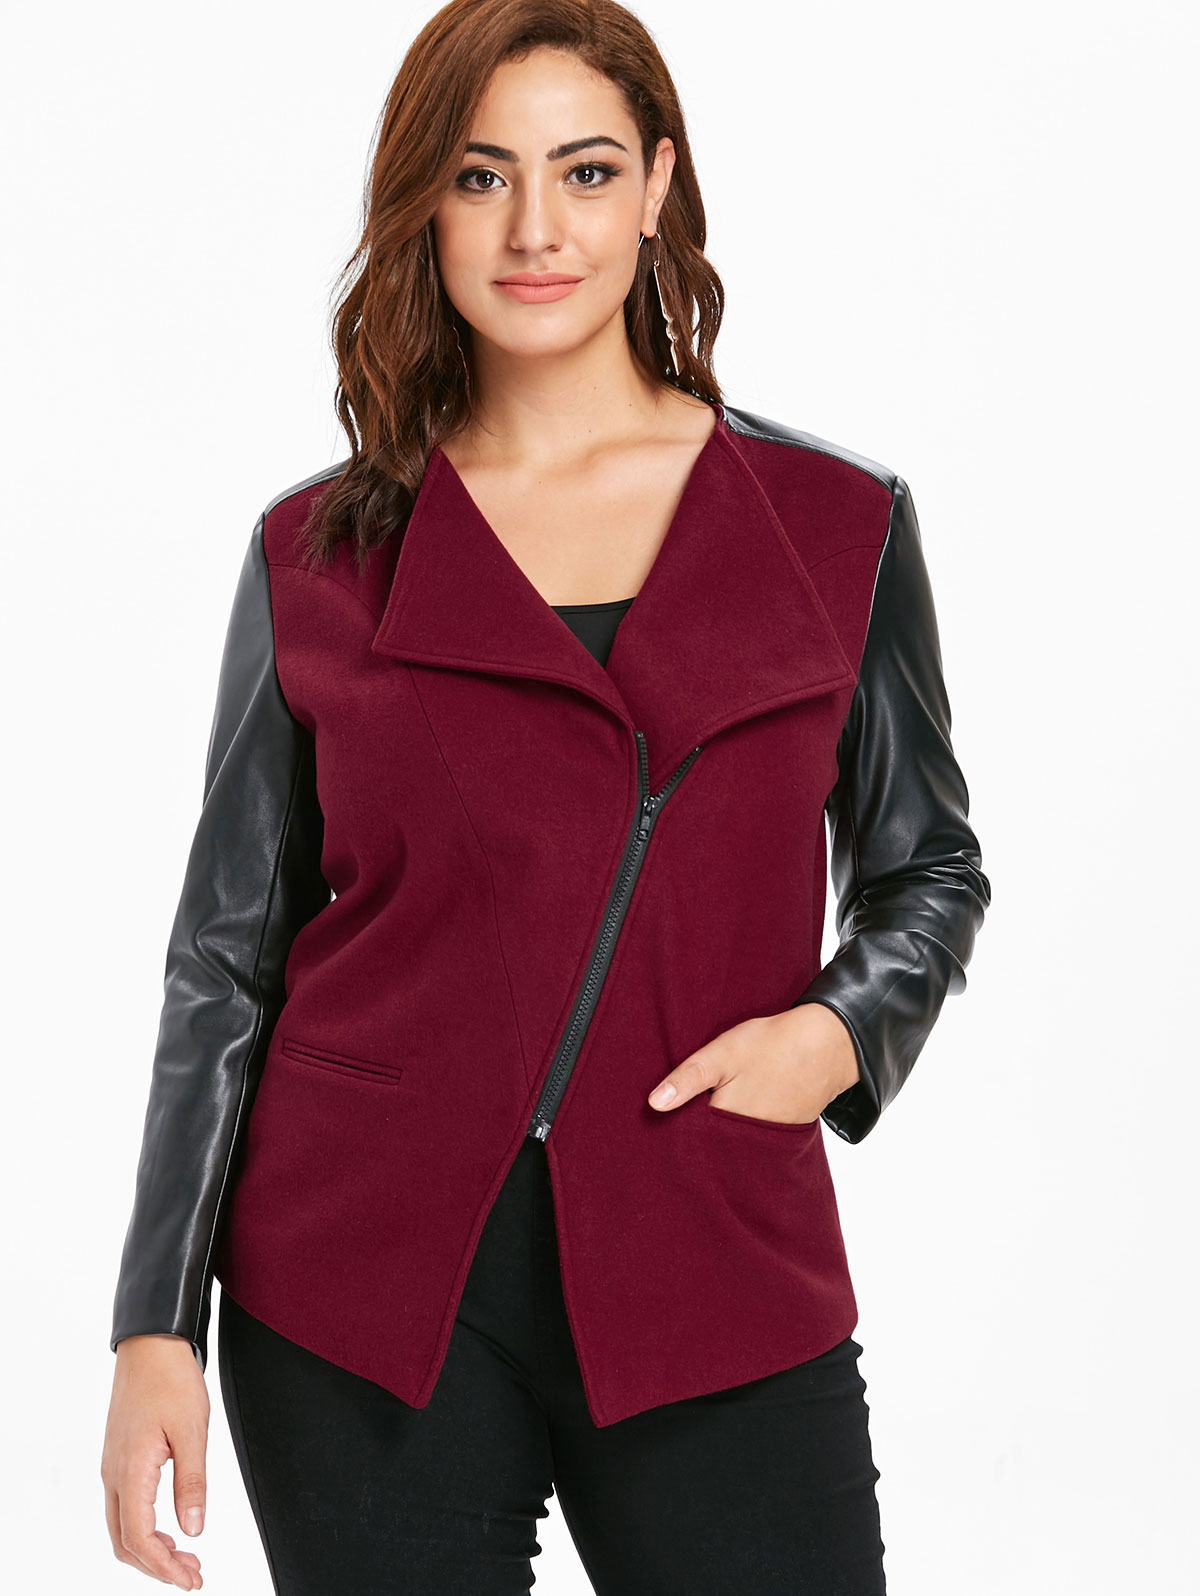 Wipalo Plus Size Faux Leather Color Block Panel Jacket Women Winter Autumn  Slim Lapel Long Sleeve Outerwear Jackets 2019 Coat 64394ae5b9e7